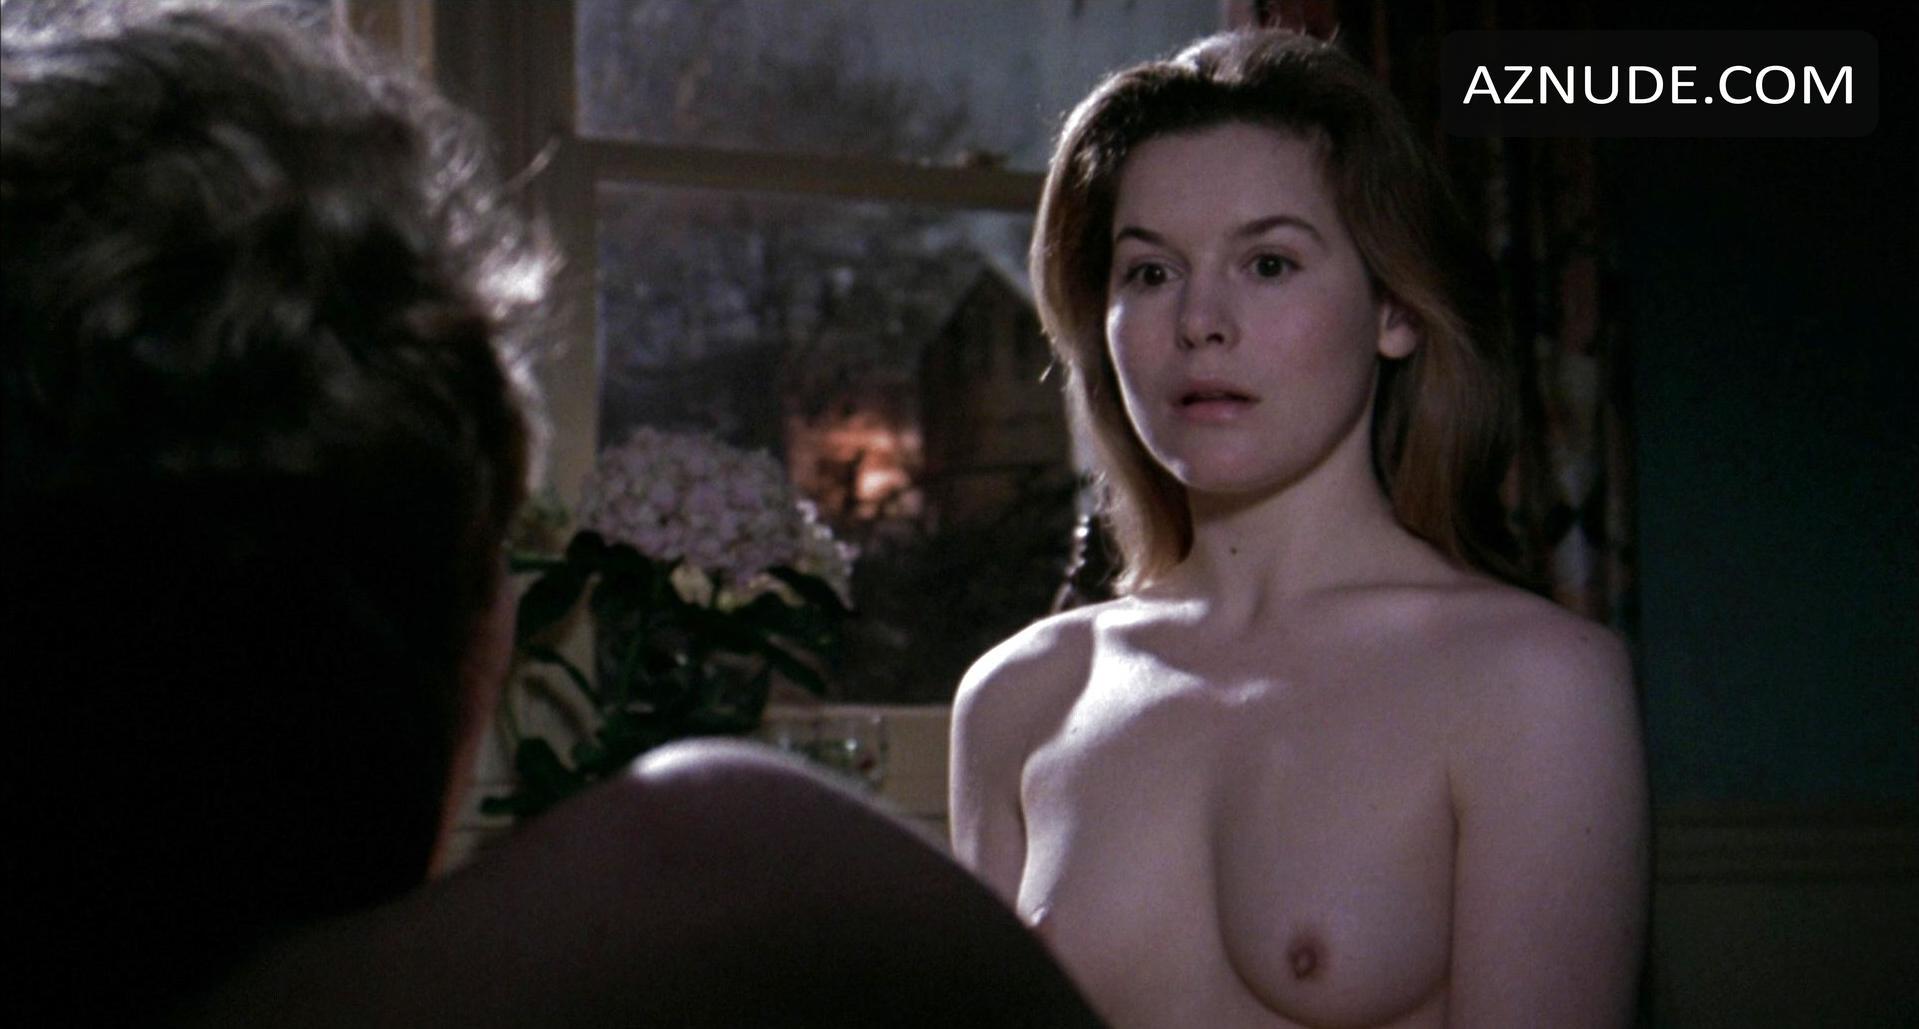 nude women do sex